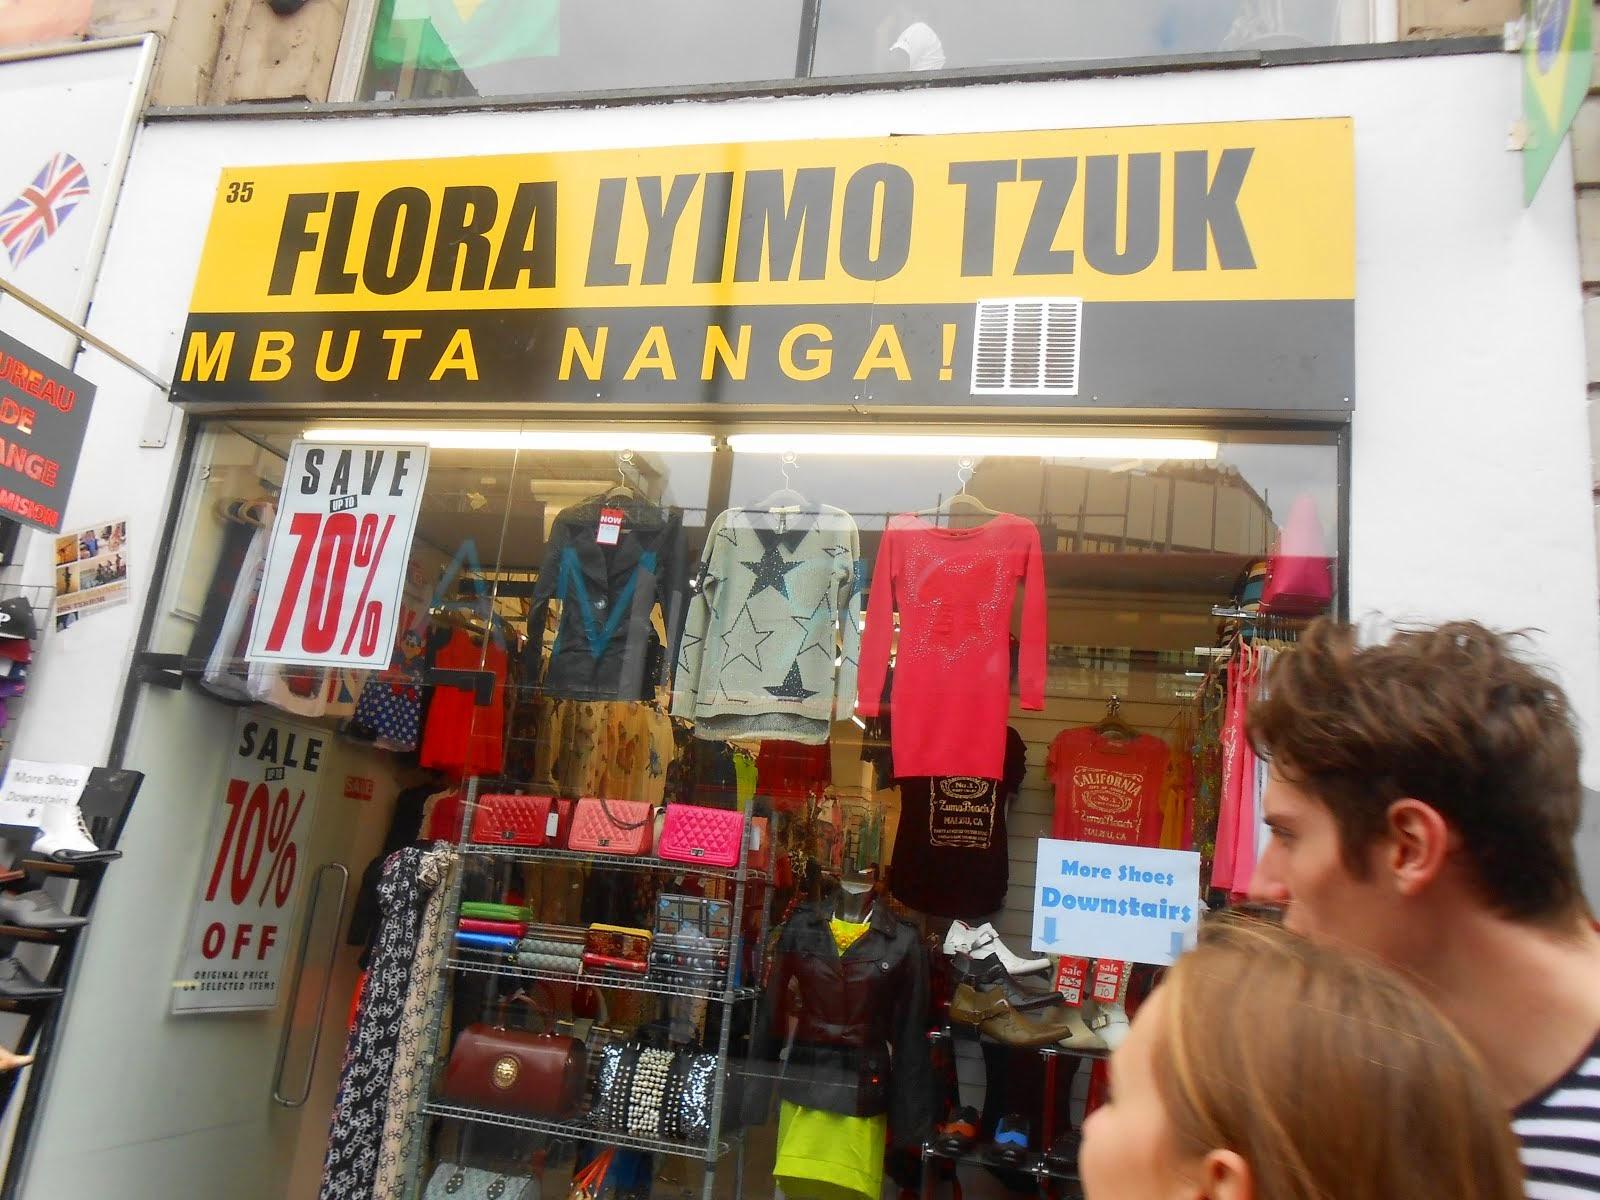 FLORA LYIMO TZUK